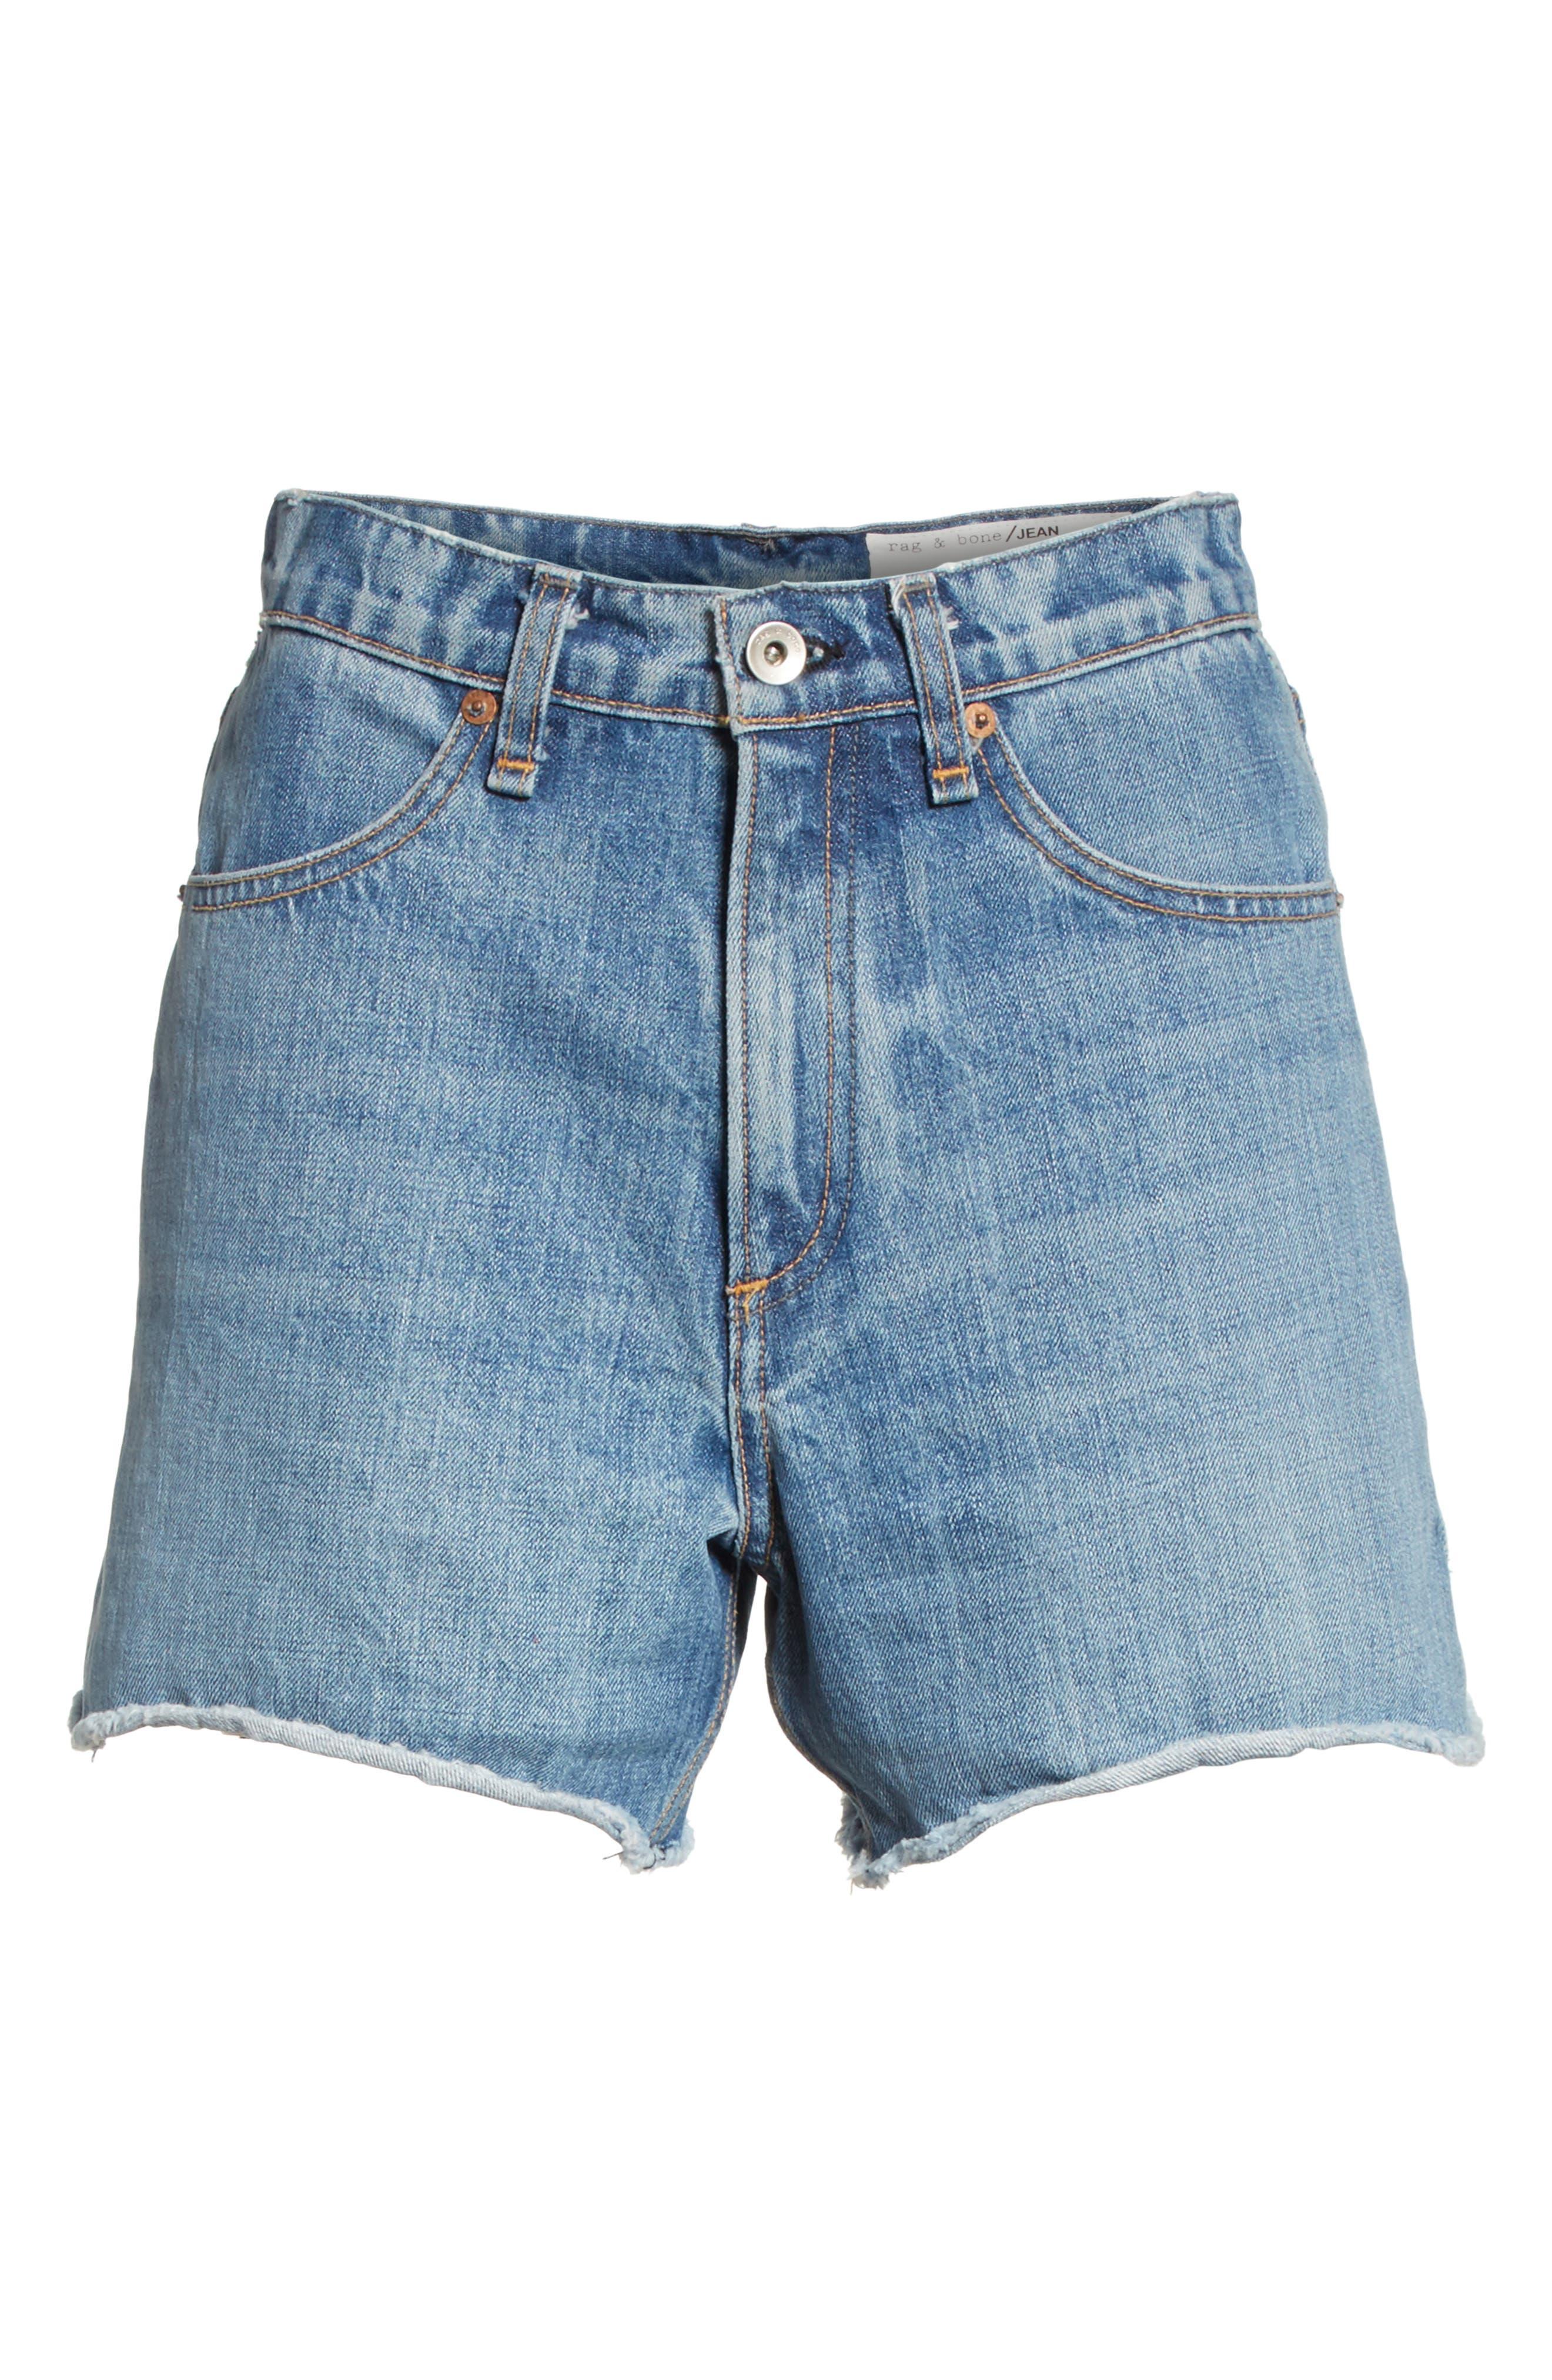 Torti High Waist Denim Shorts,                             Alternate thumbnail 6, color,                             Vintage